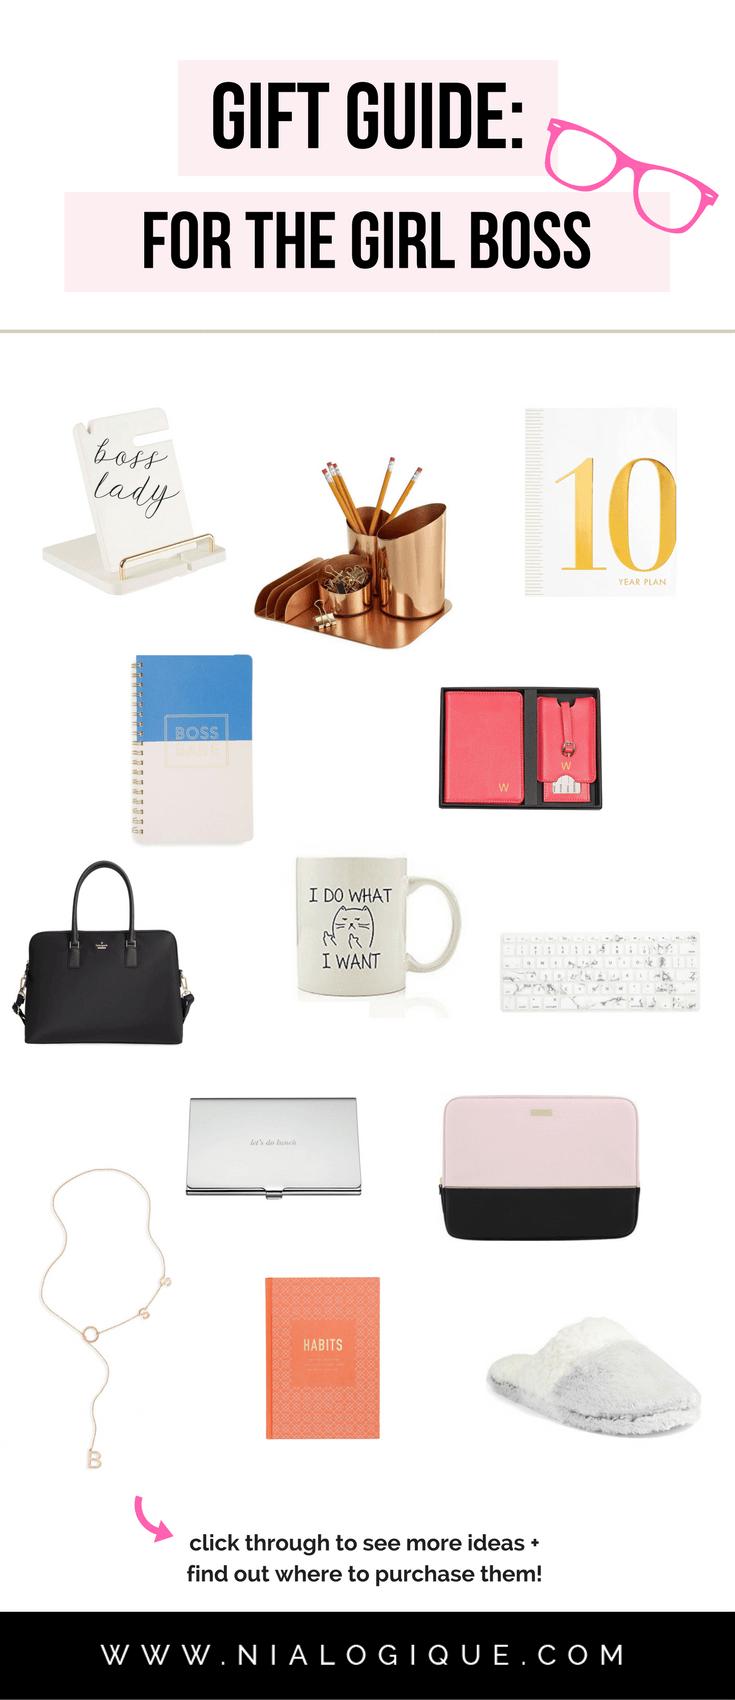 Gift Guide: For The Girl Boss | Gift Ideas | Pinterest | Gifts, Gift ...